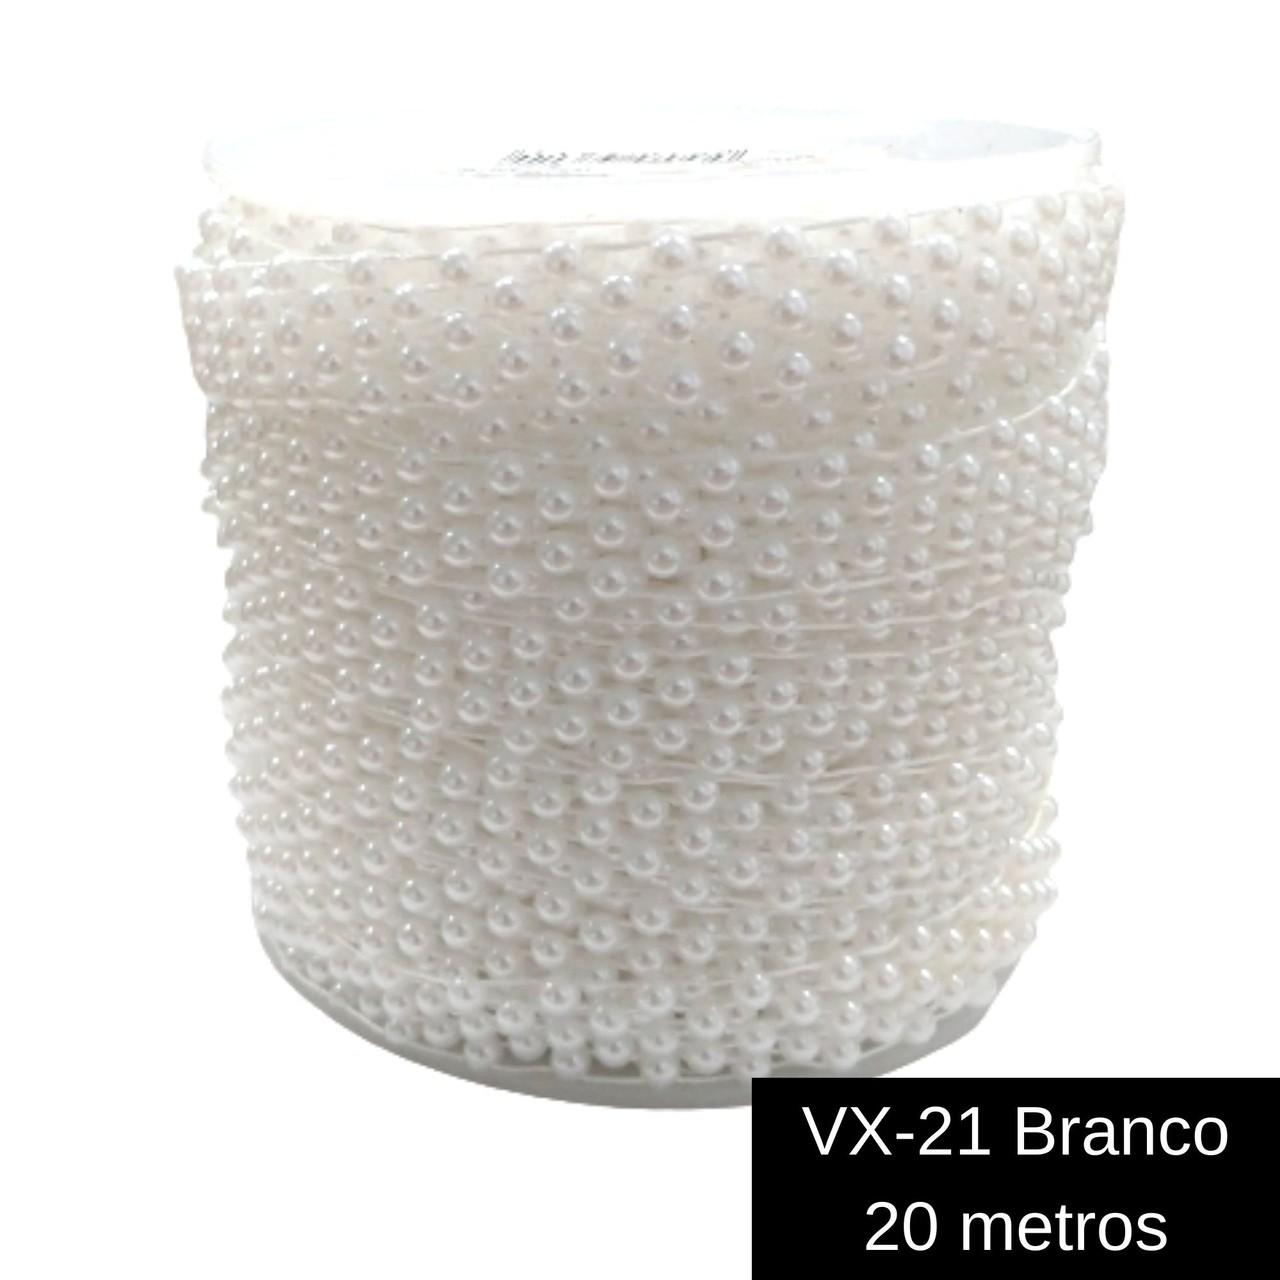 Galão Corrente / Aljofre Plástico Formato Meia Pérola